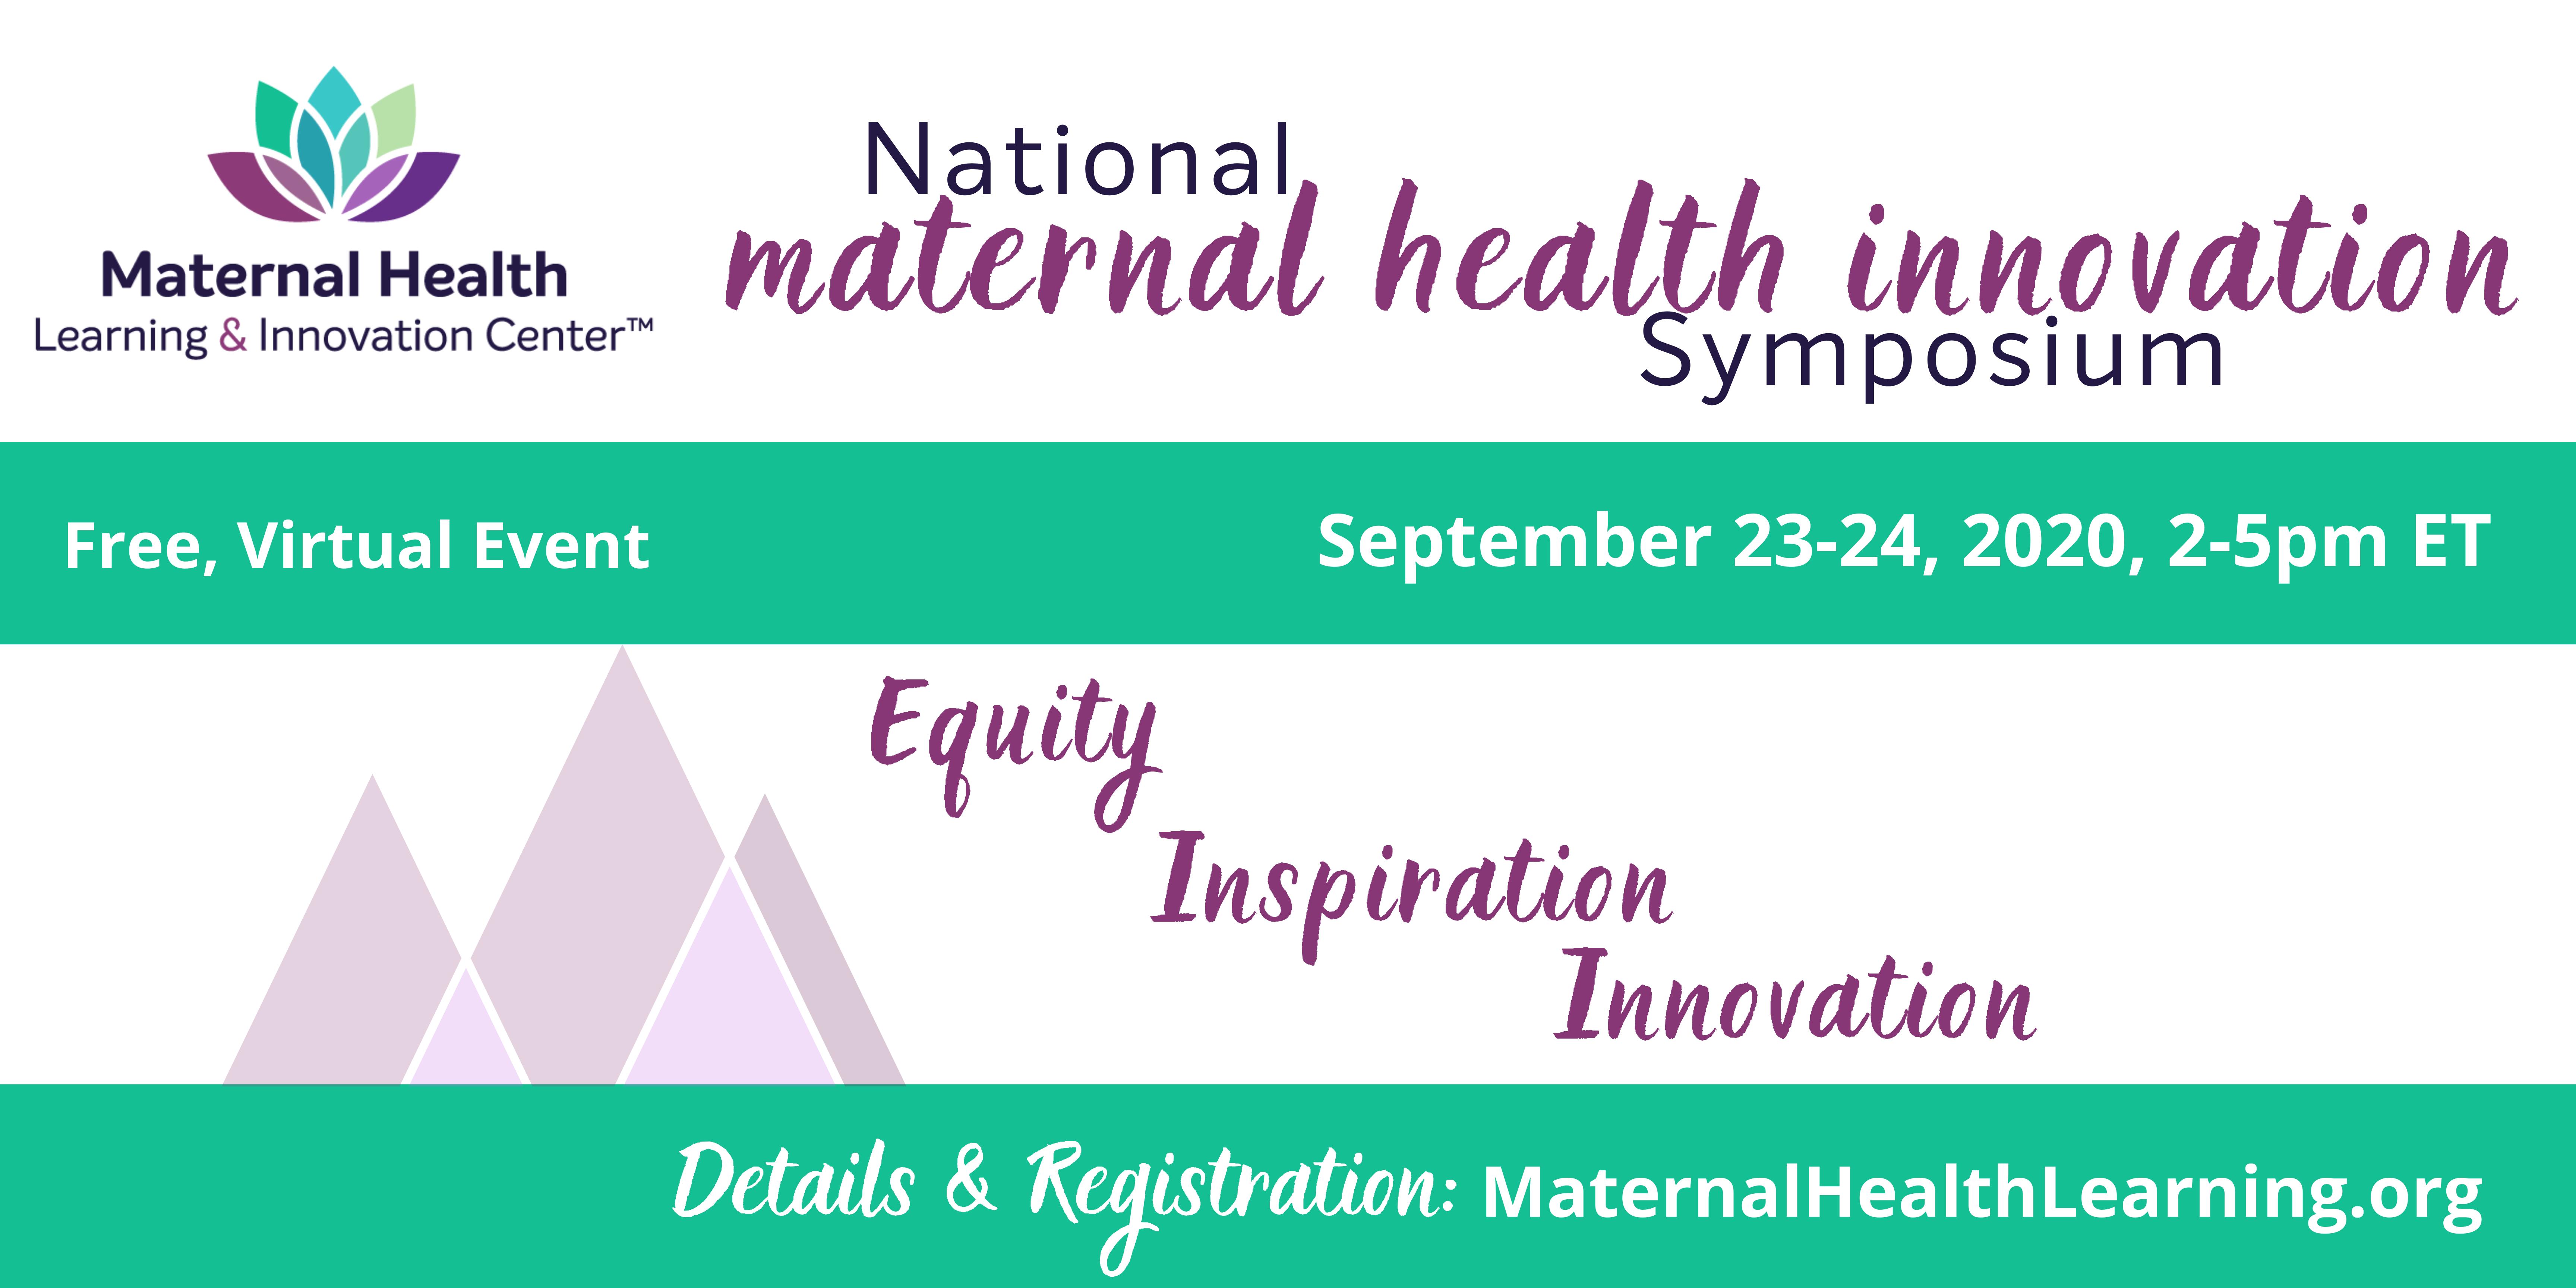 Maternal Health Symposium